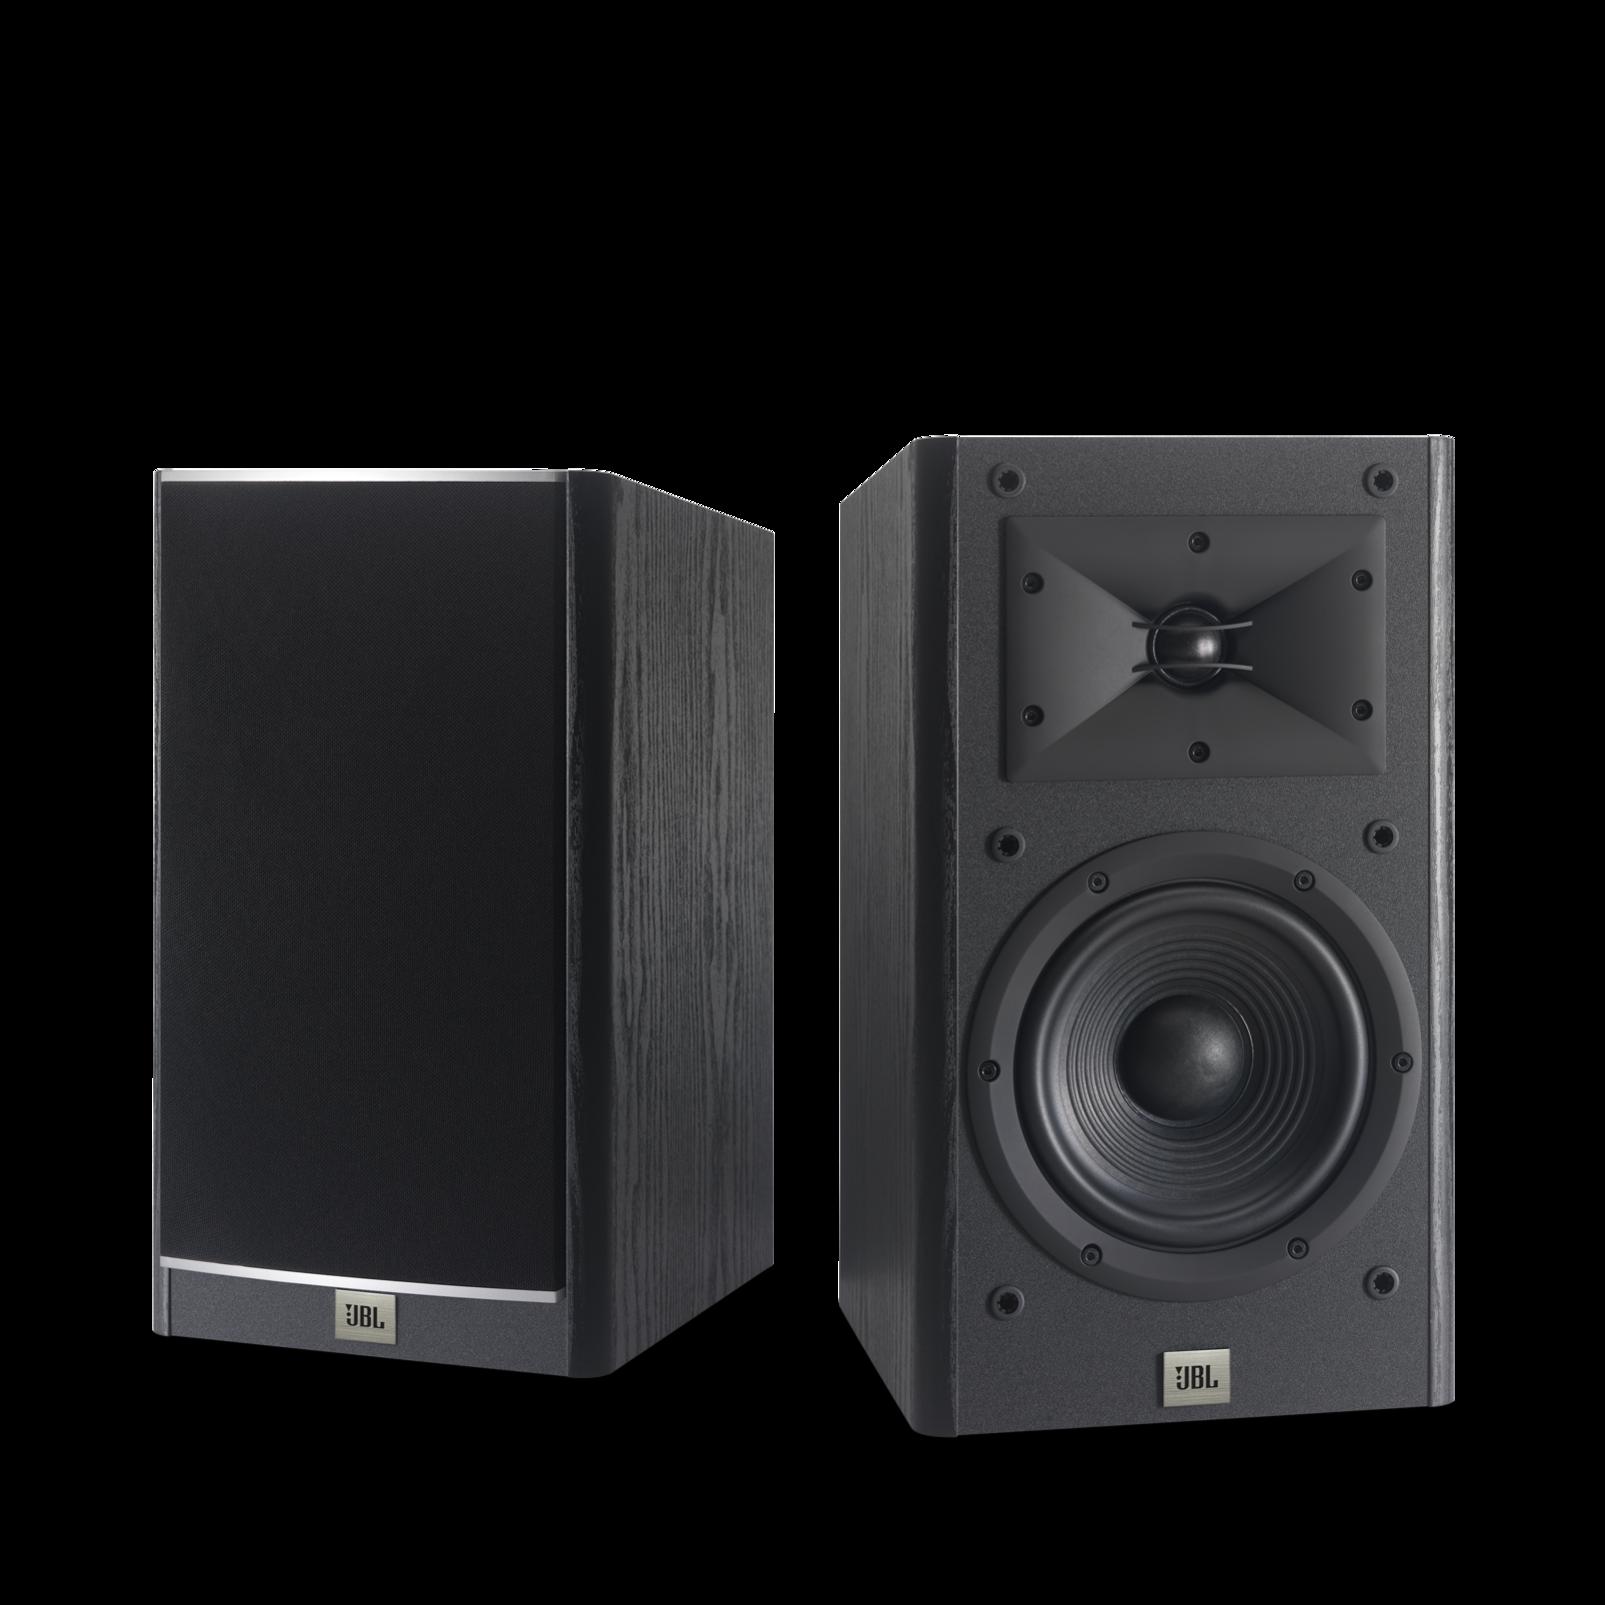 Yamaha Speaker Malaysia Price